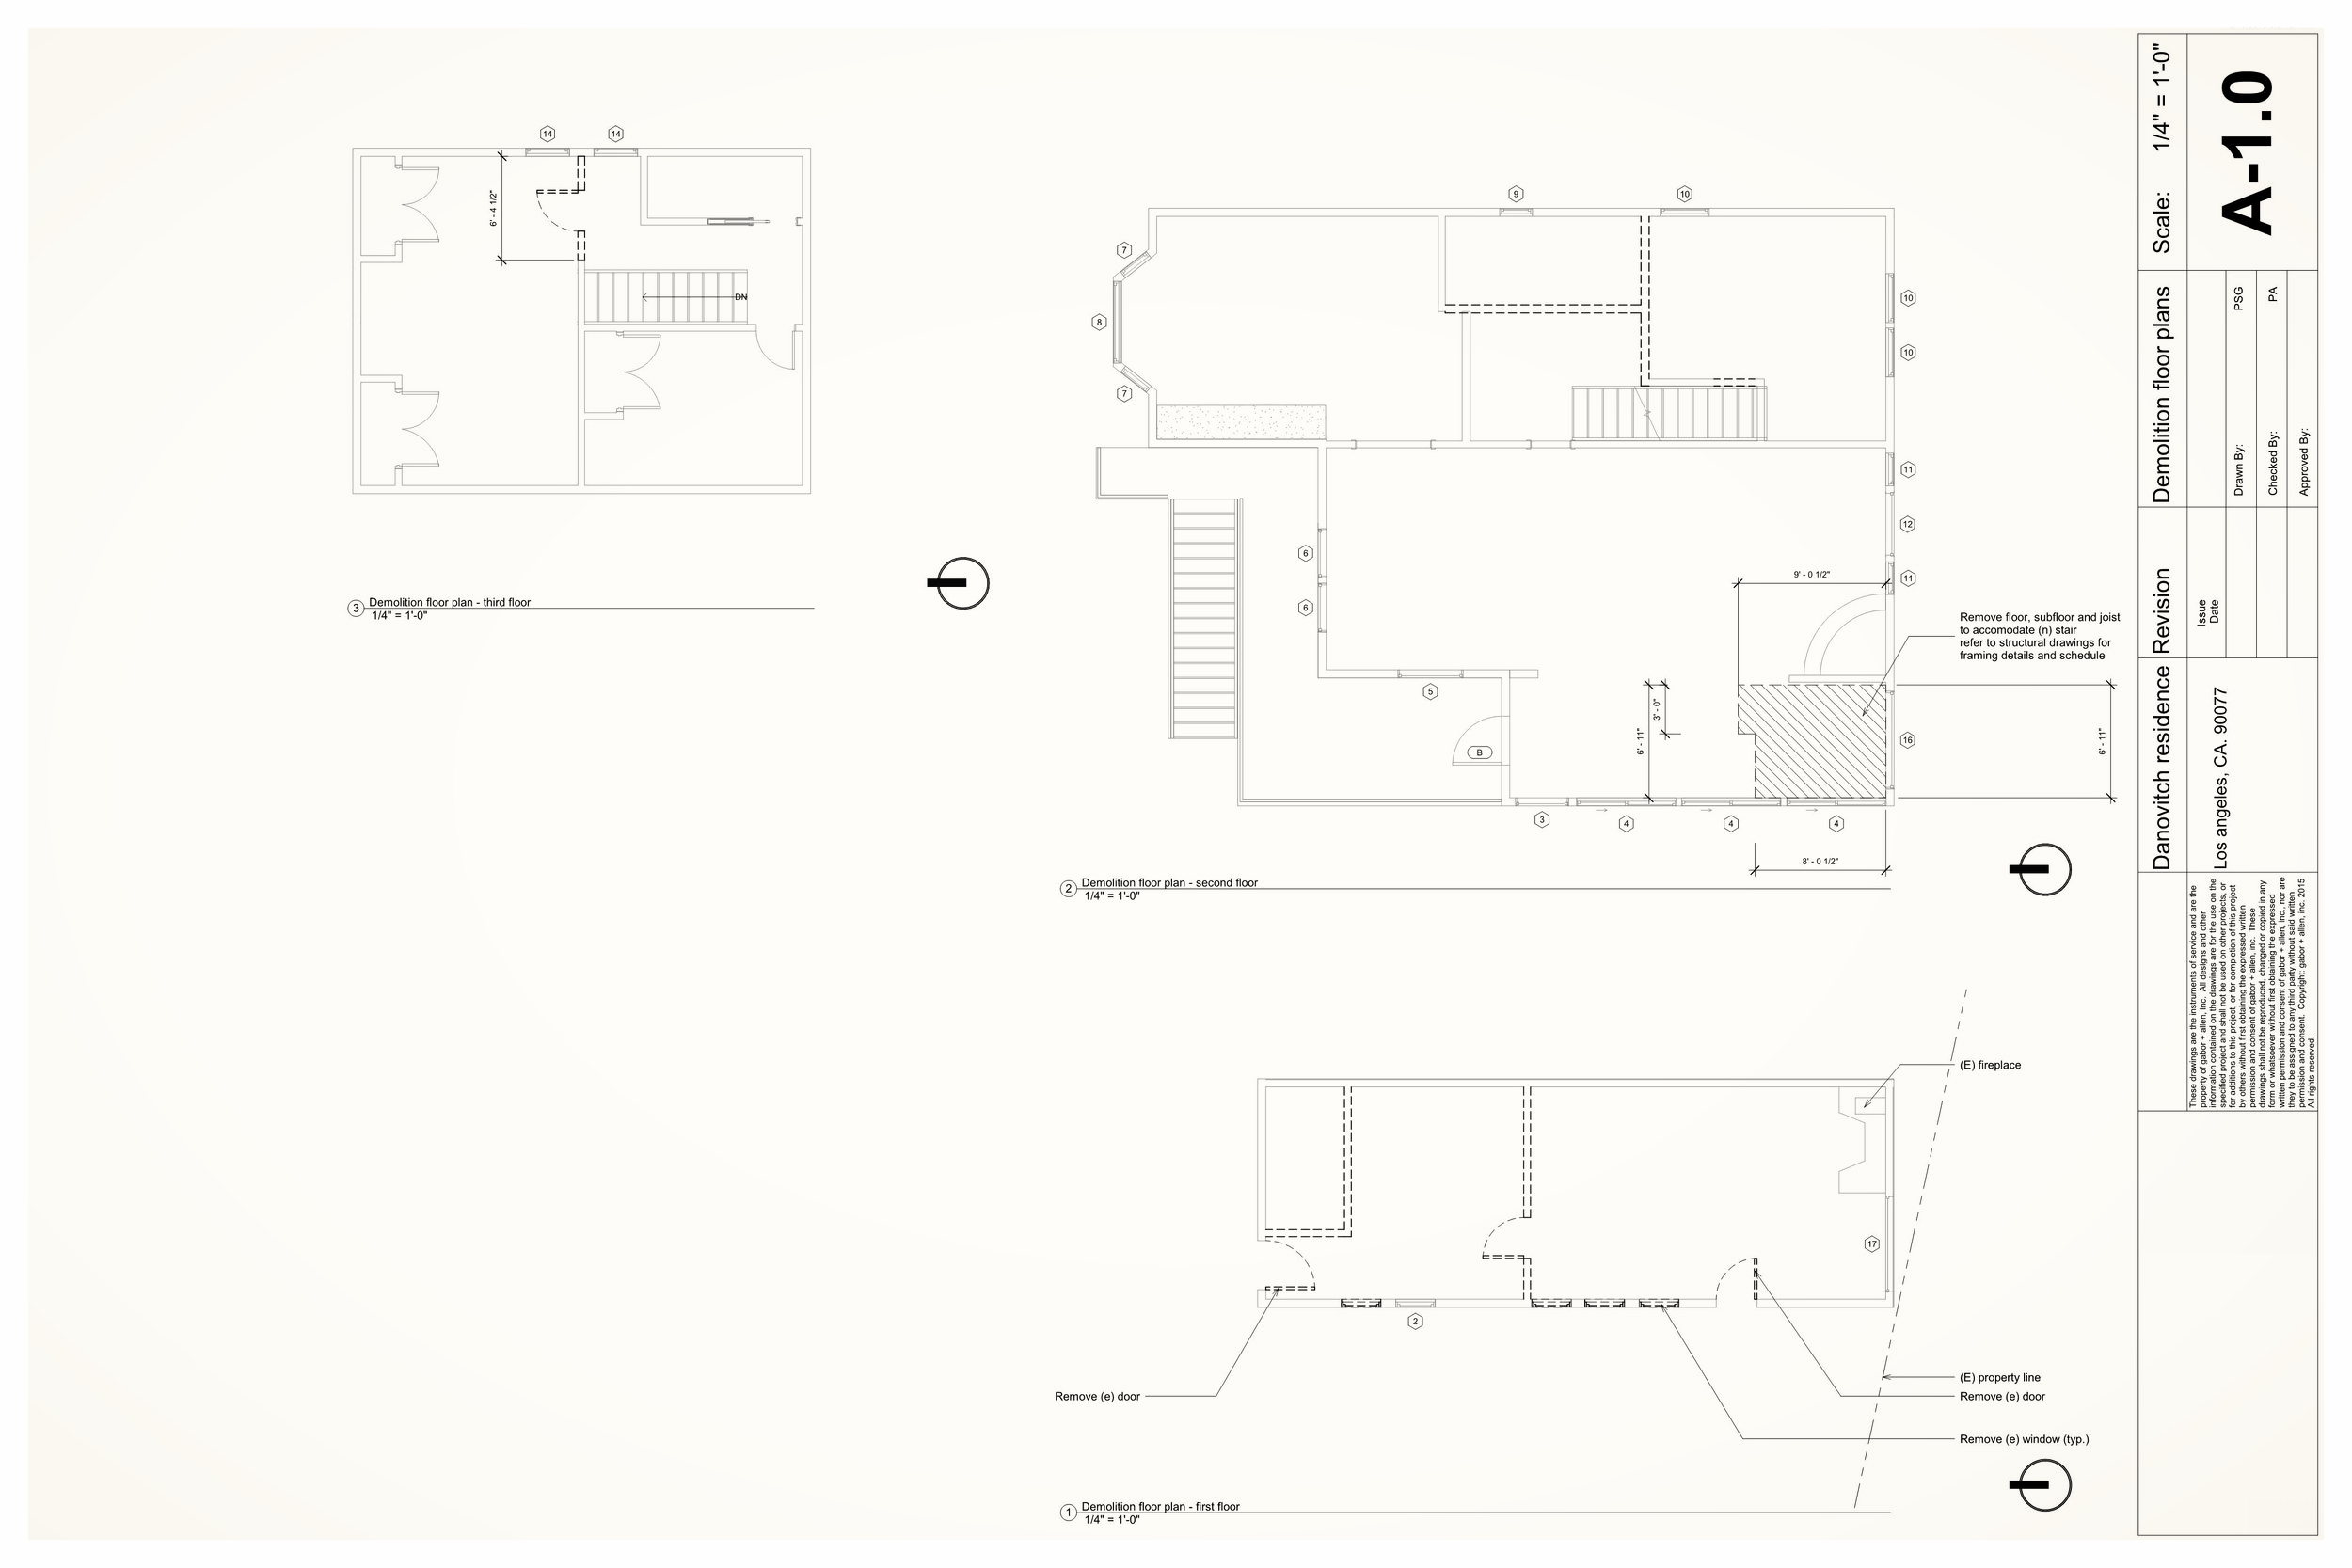 Danovitch-set-12.10.18 Page 002.jpg